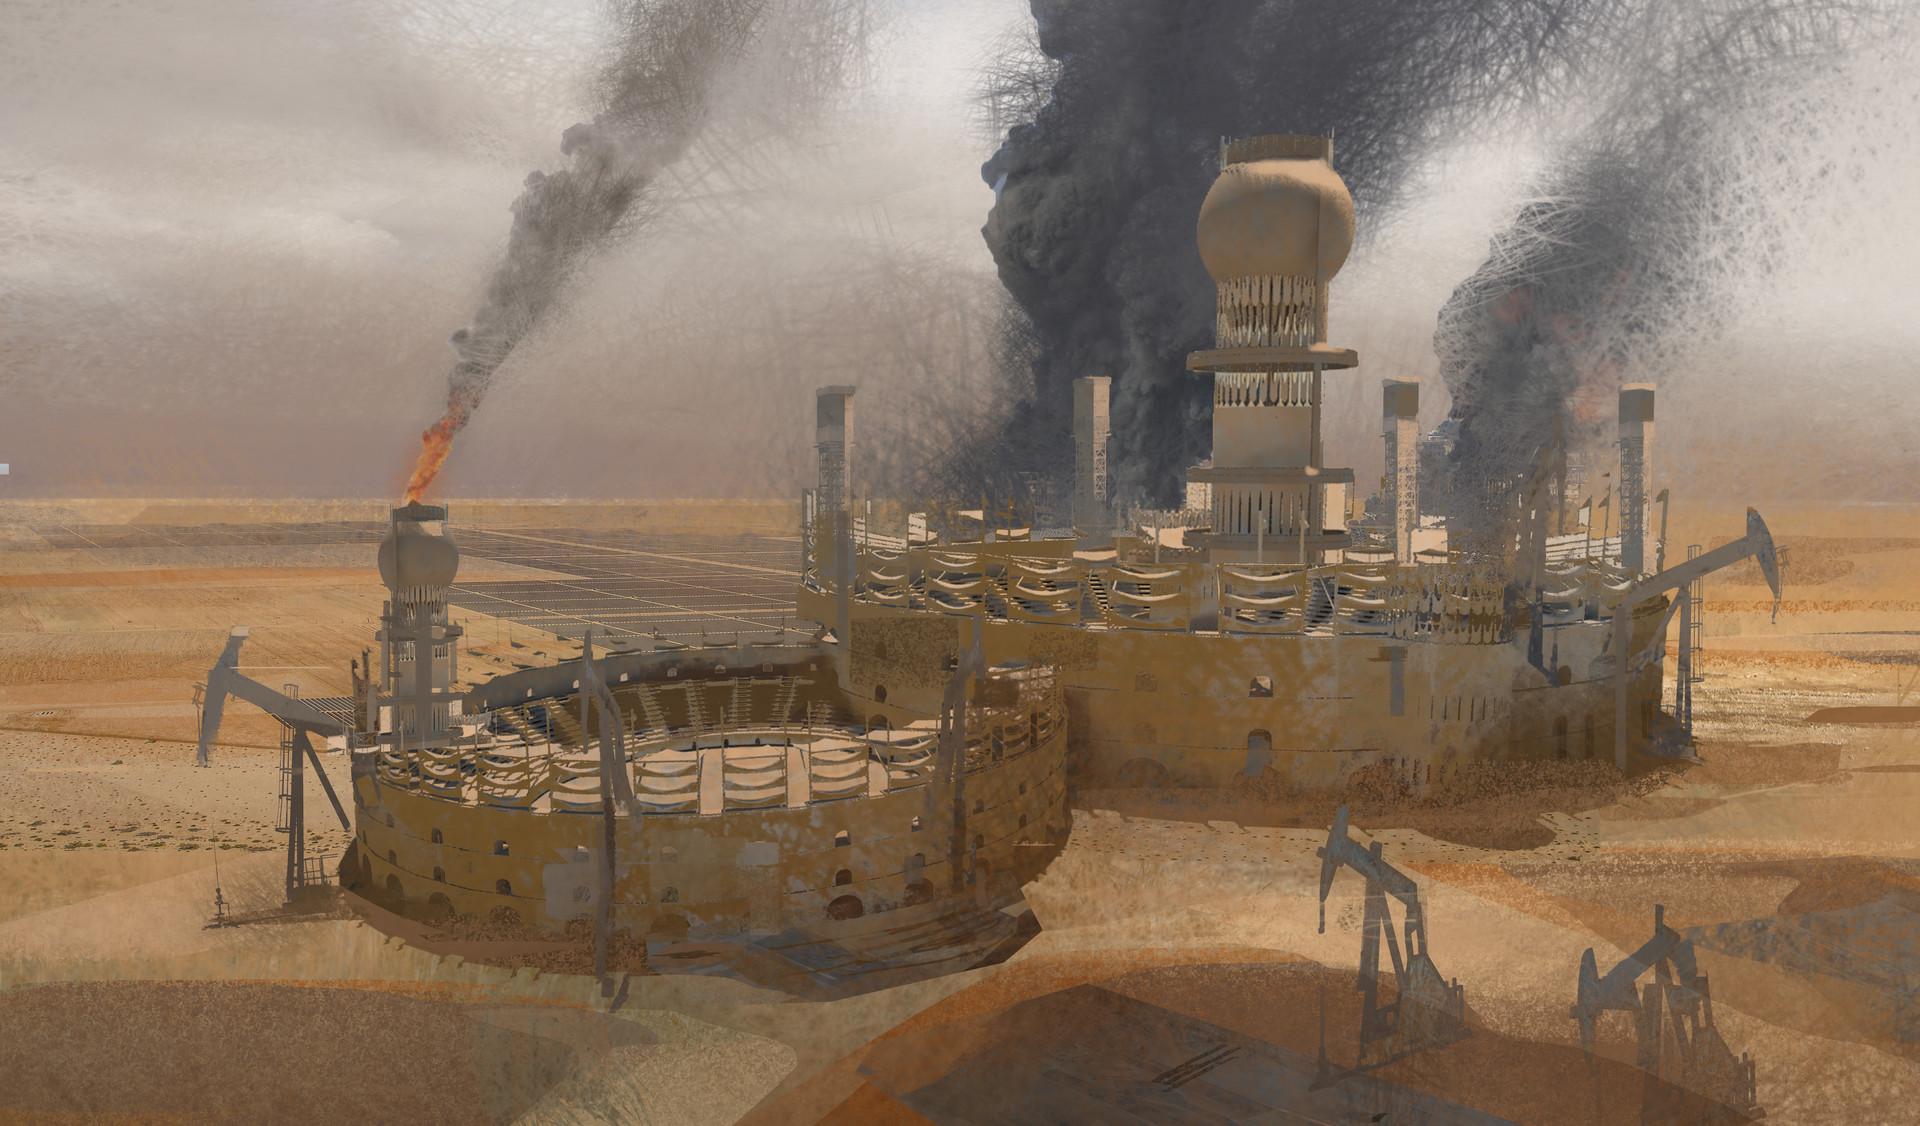 Yujin choo oilfield1 revisionsketch 01